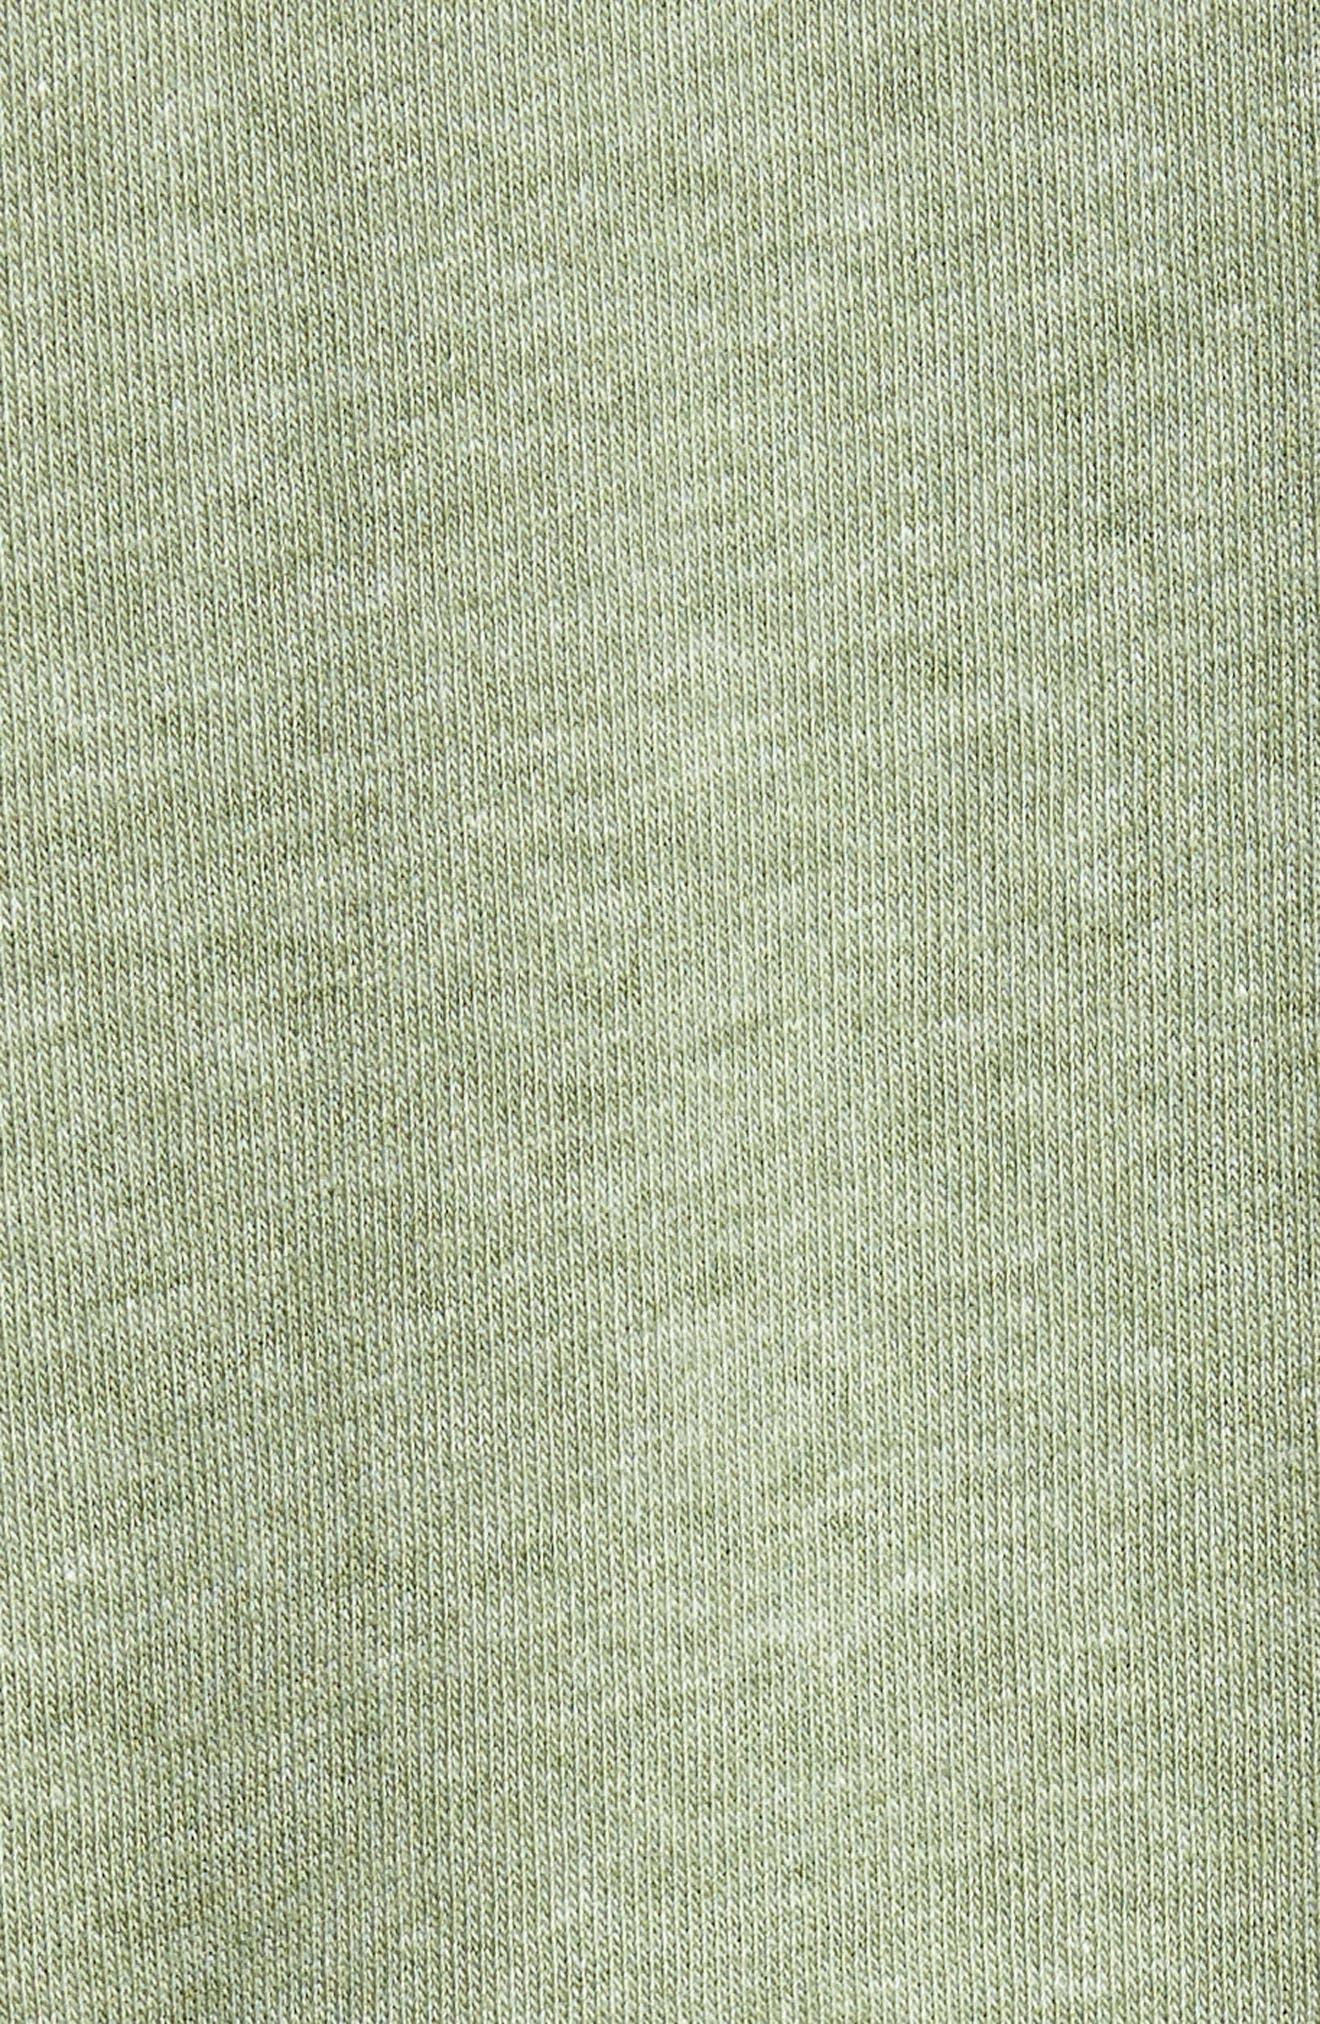 Mt. Hood Crewneck T-Shirt,                             Alternate thumbnail 5, color,                             FOREST GREEN